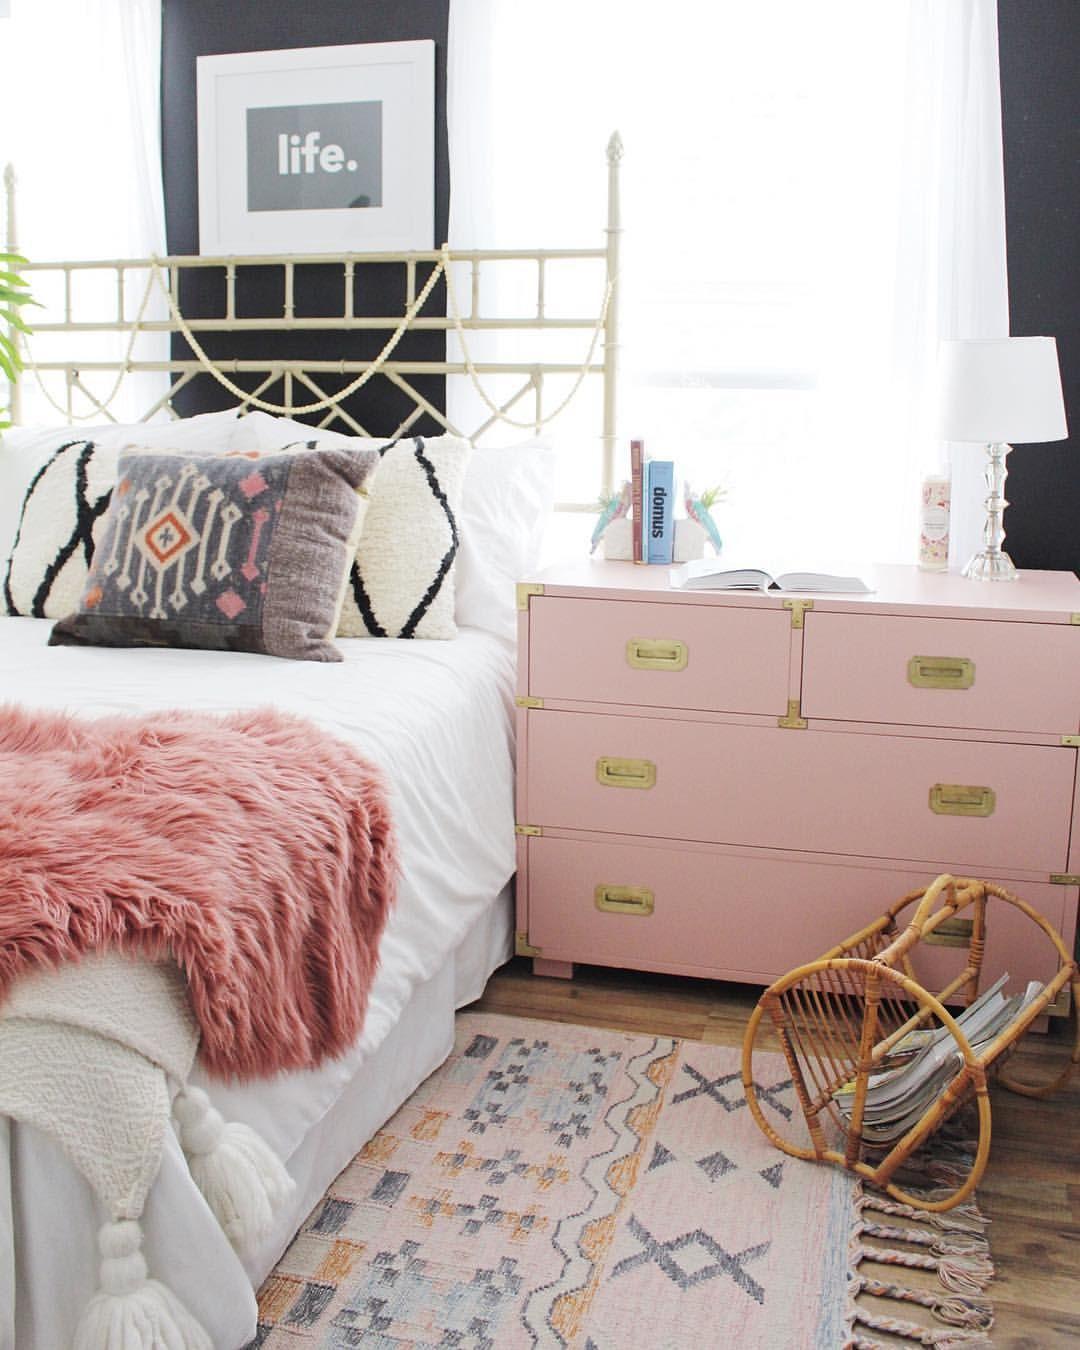 Twin loft bed craigslist   Likes  Comments  Cara Irwin  Goldalamode goldalamode